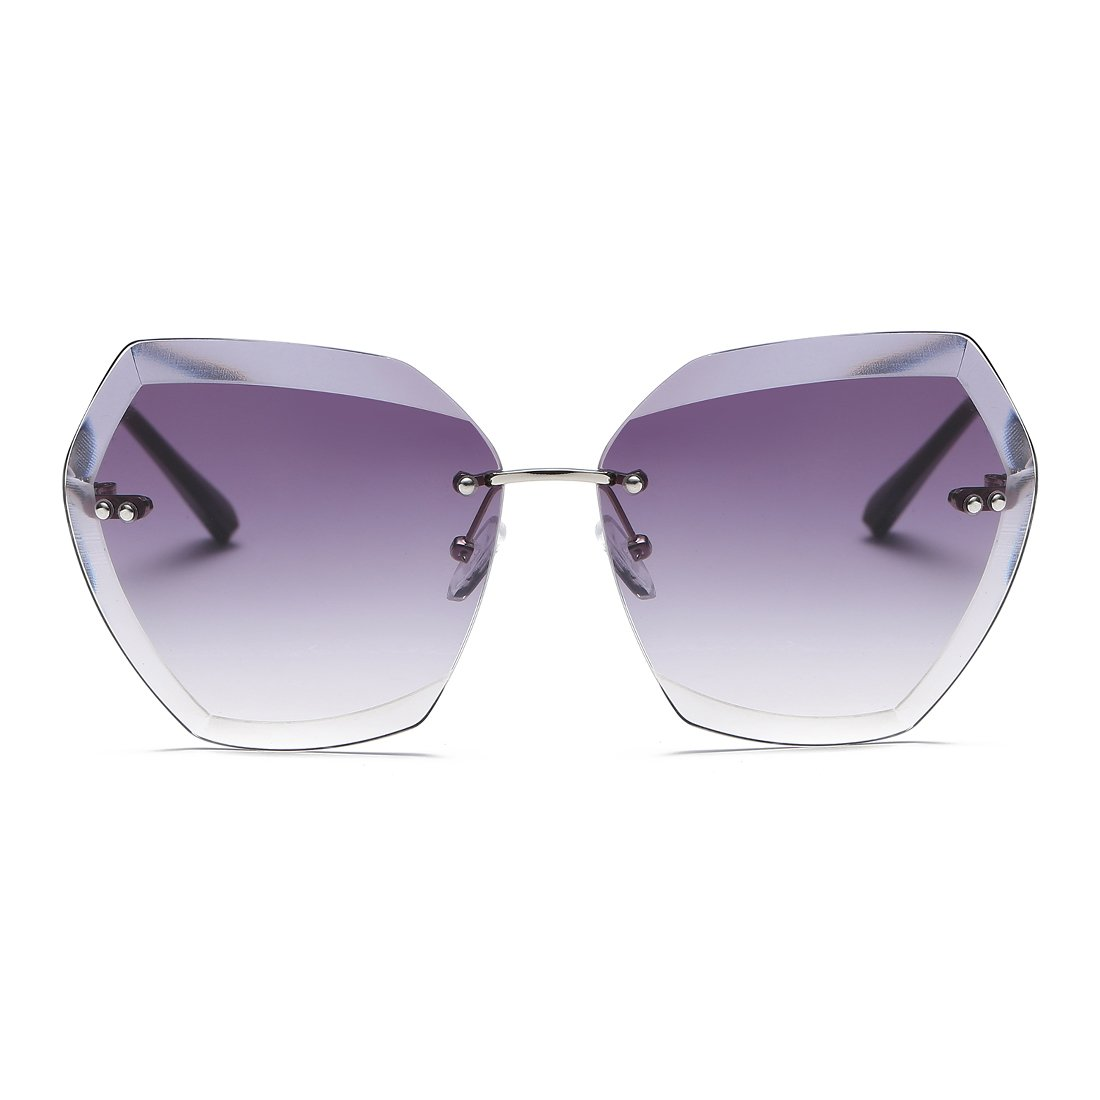 Best Gucci sunglasses for women